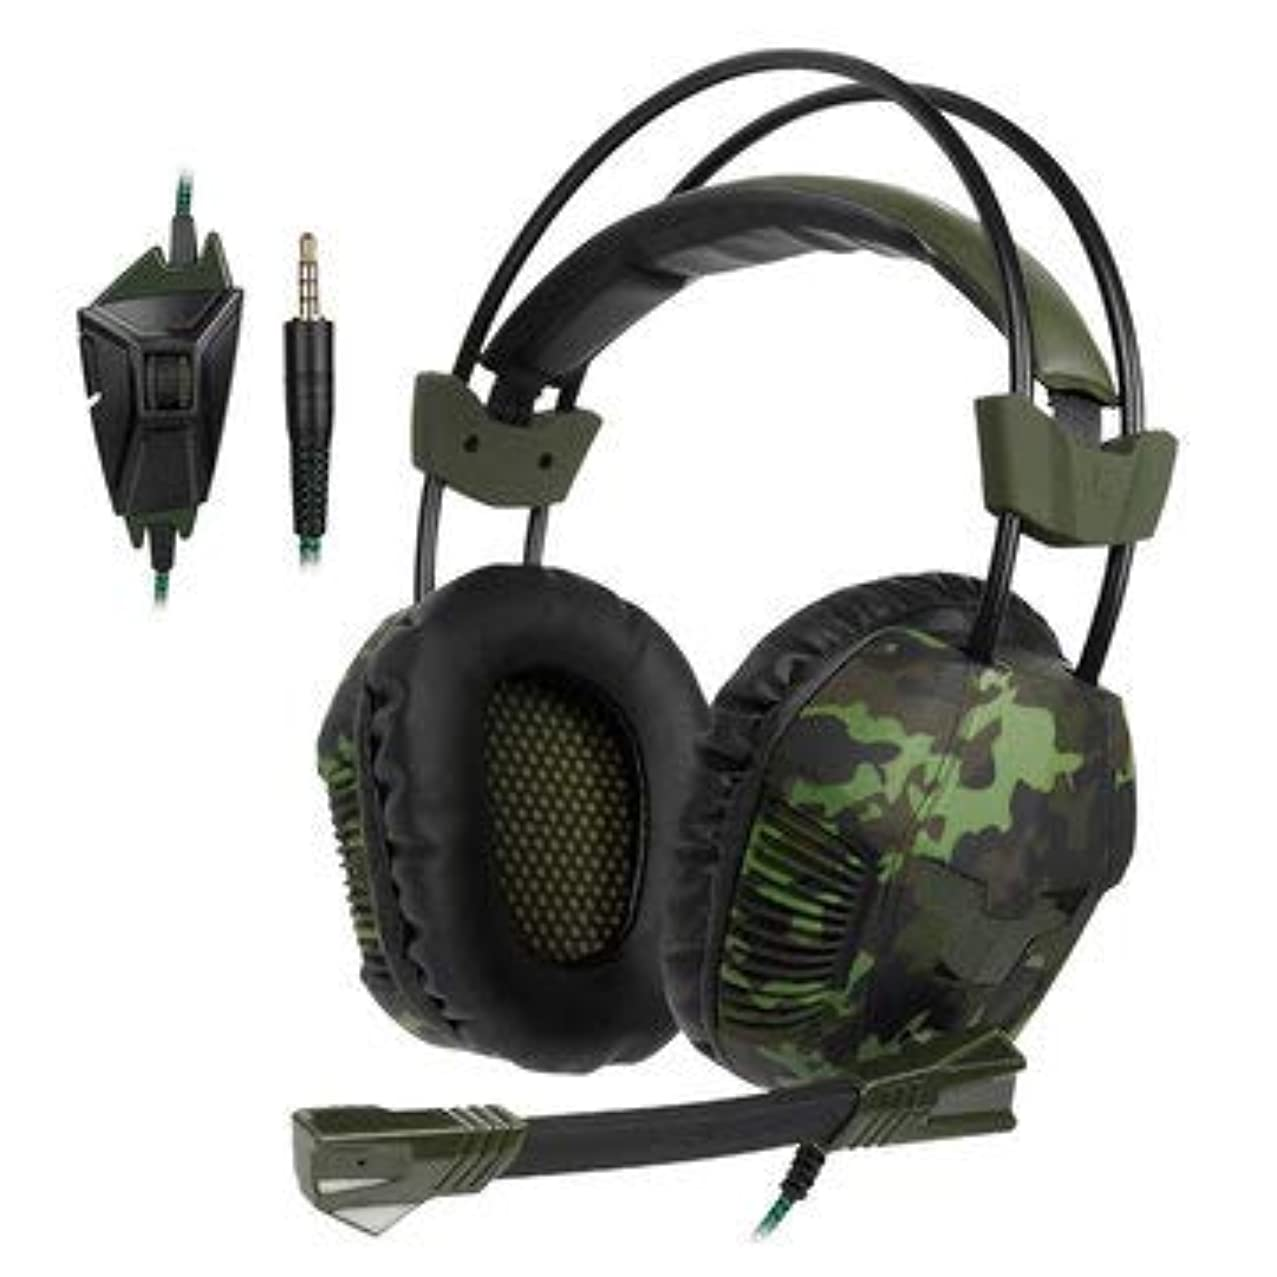 SA-921 PLUS Stereo Gaming Headphone Headset with Microphone Line Control - Earphones & Speakers On-ear & Over-ear Headphones